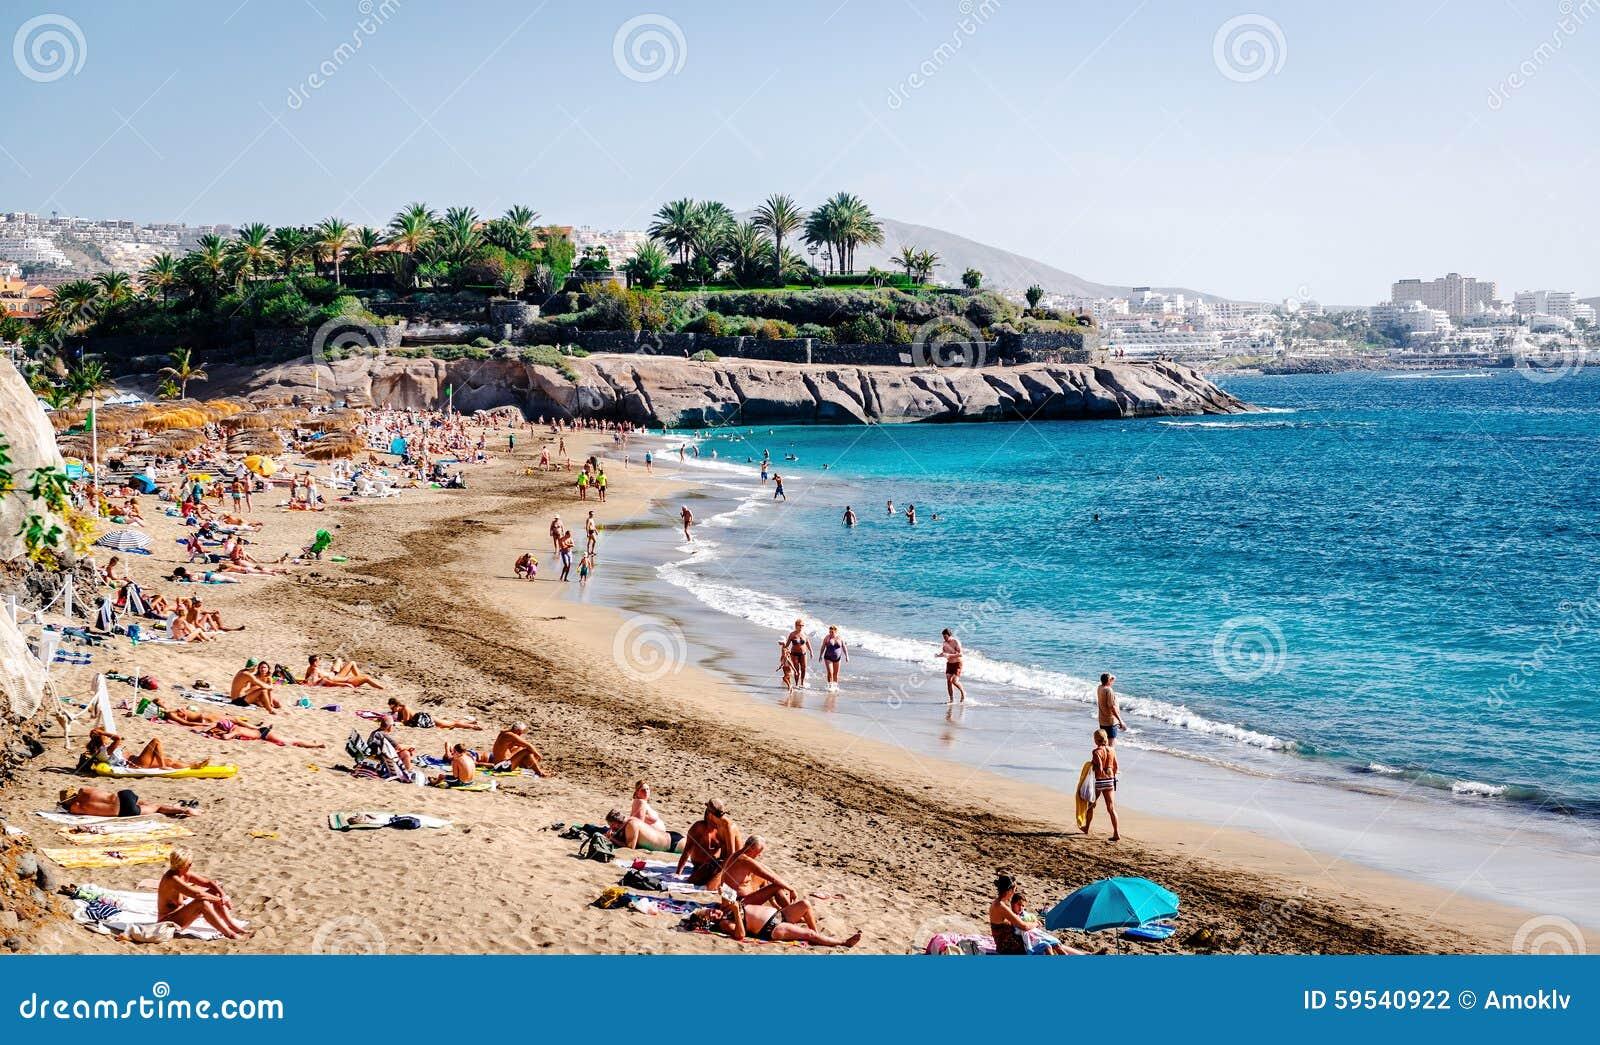 El duque beach in tenerife canary islands editorial for Designhotel teneriffa